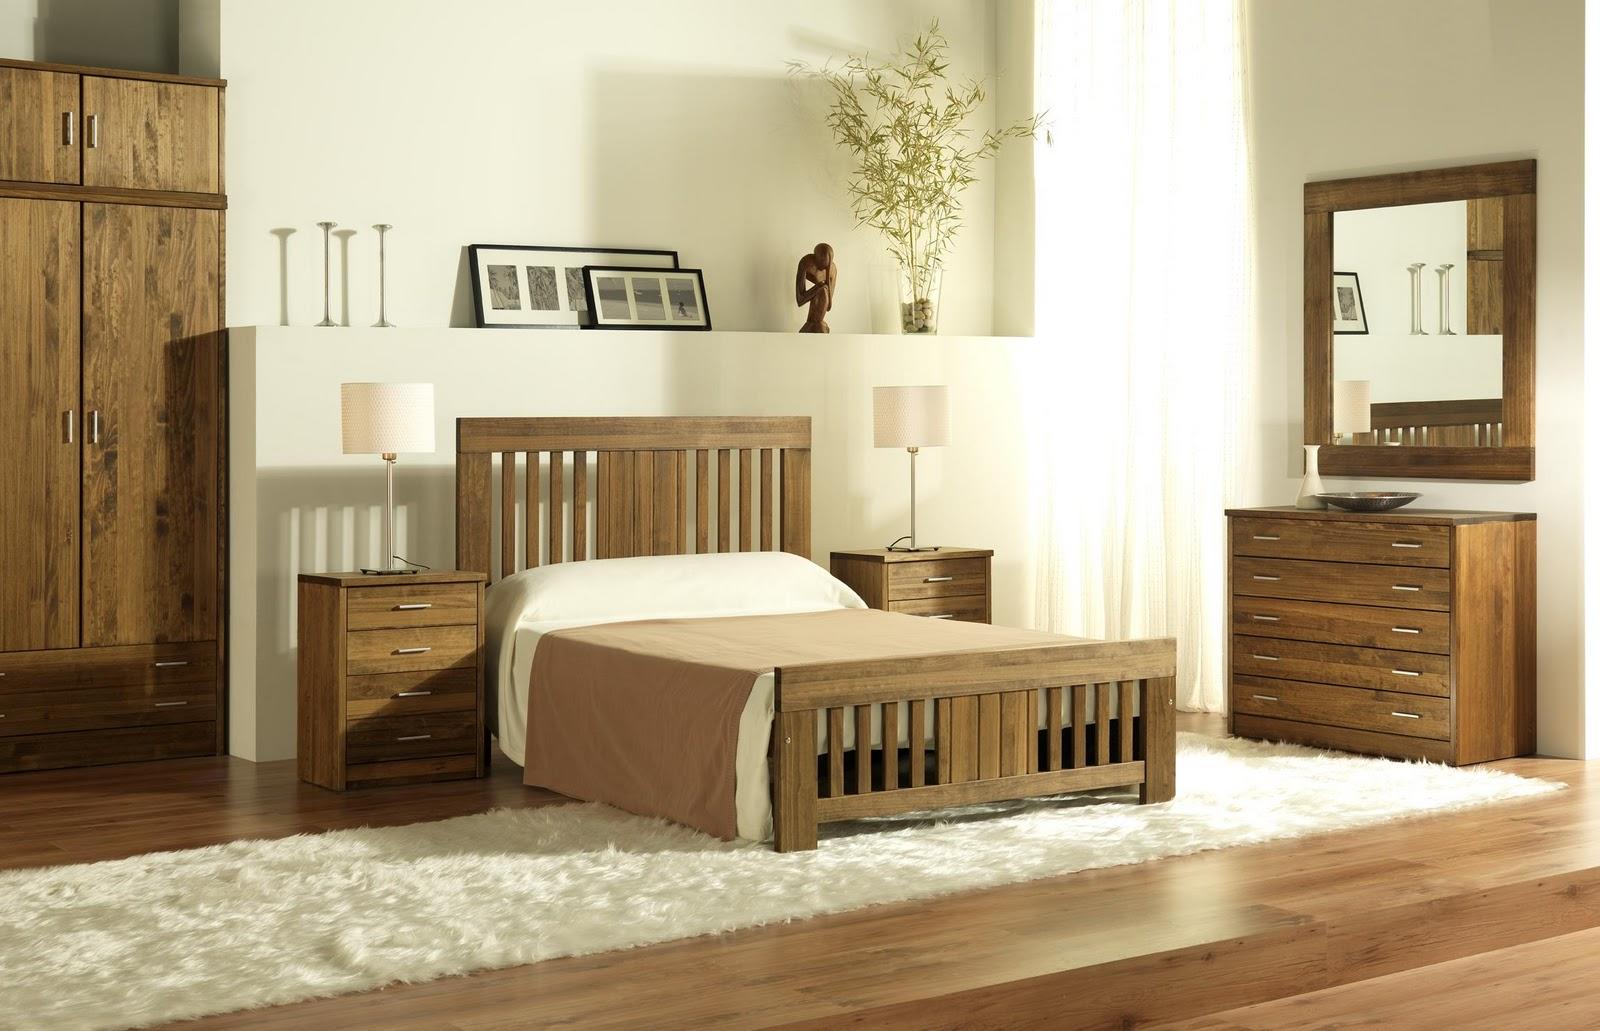 Muebles toscapino dormitorios for Cama oficina